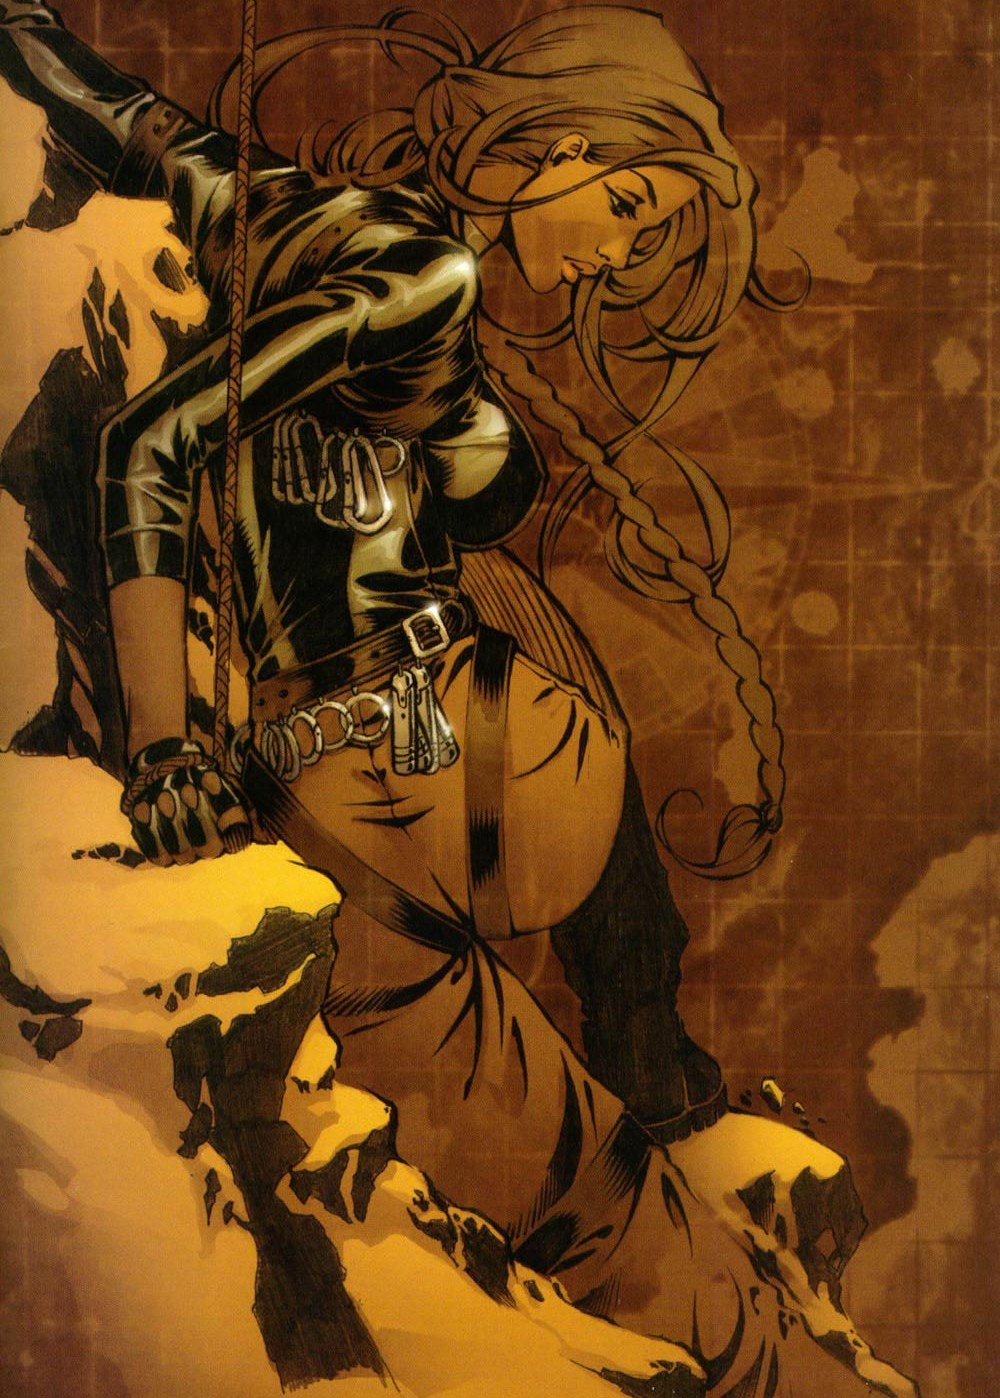 Orc fucks lara croft erotic image